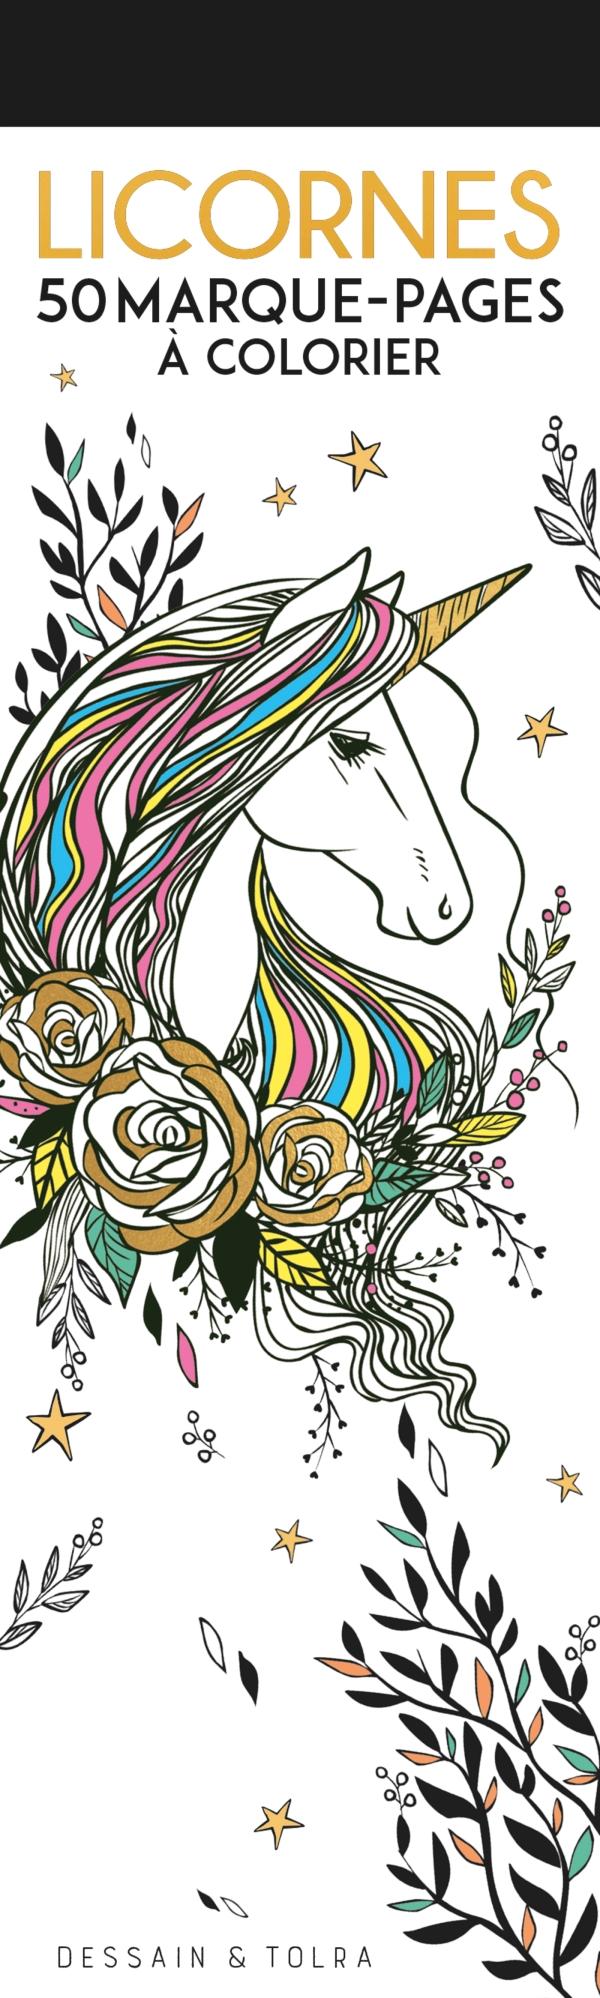 Marque-pages Licornes